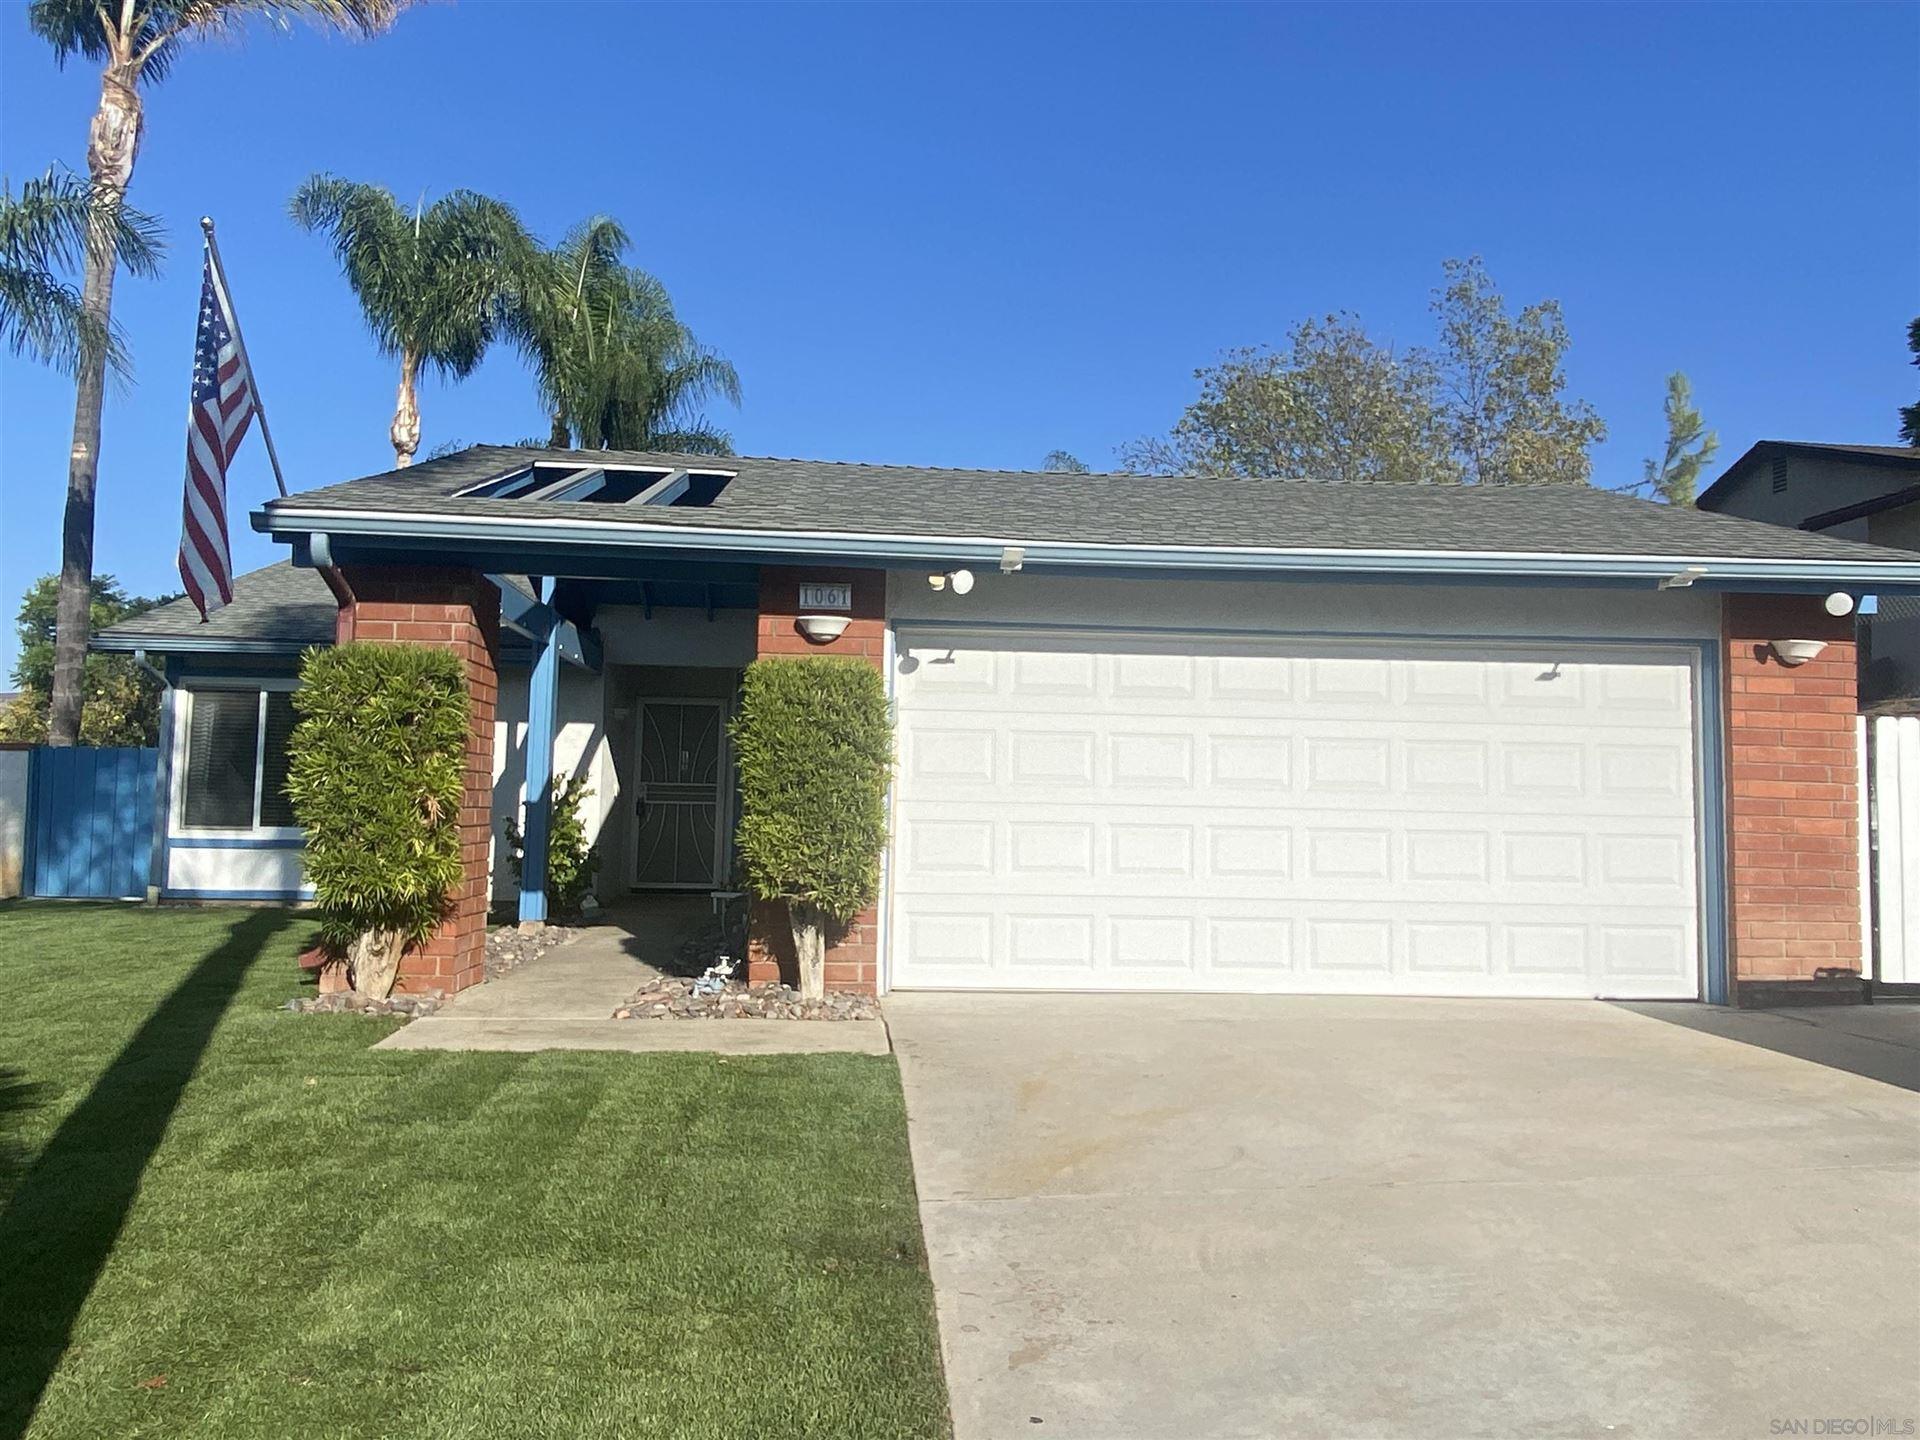 Photo of 1061 Tarlo Ct., El Cajon, CA 92019 (MLS # 210026537)